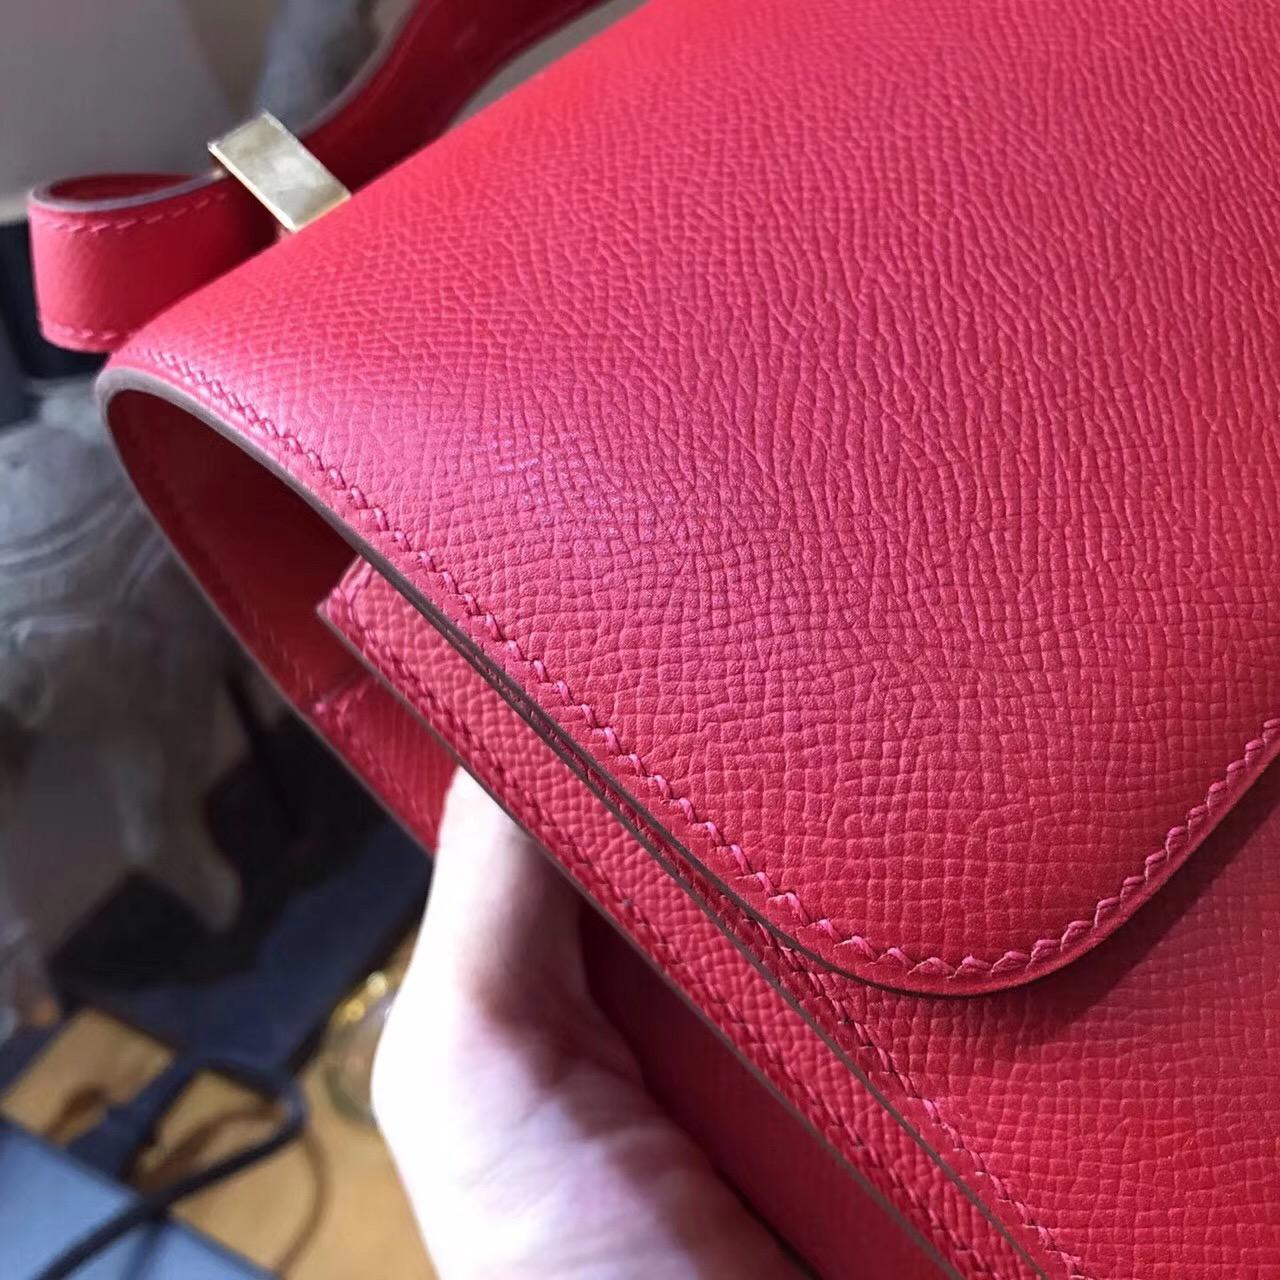 最難買的包袋Constance 24 Epsom Q5 Rouge Cossacks 中國紅 金扣